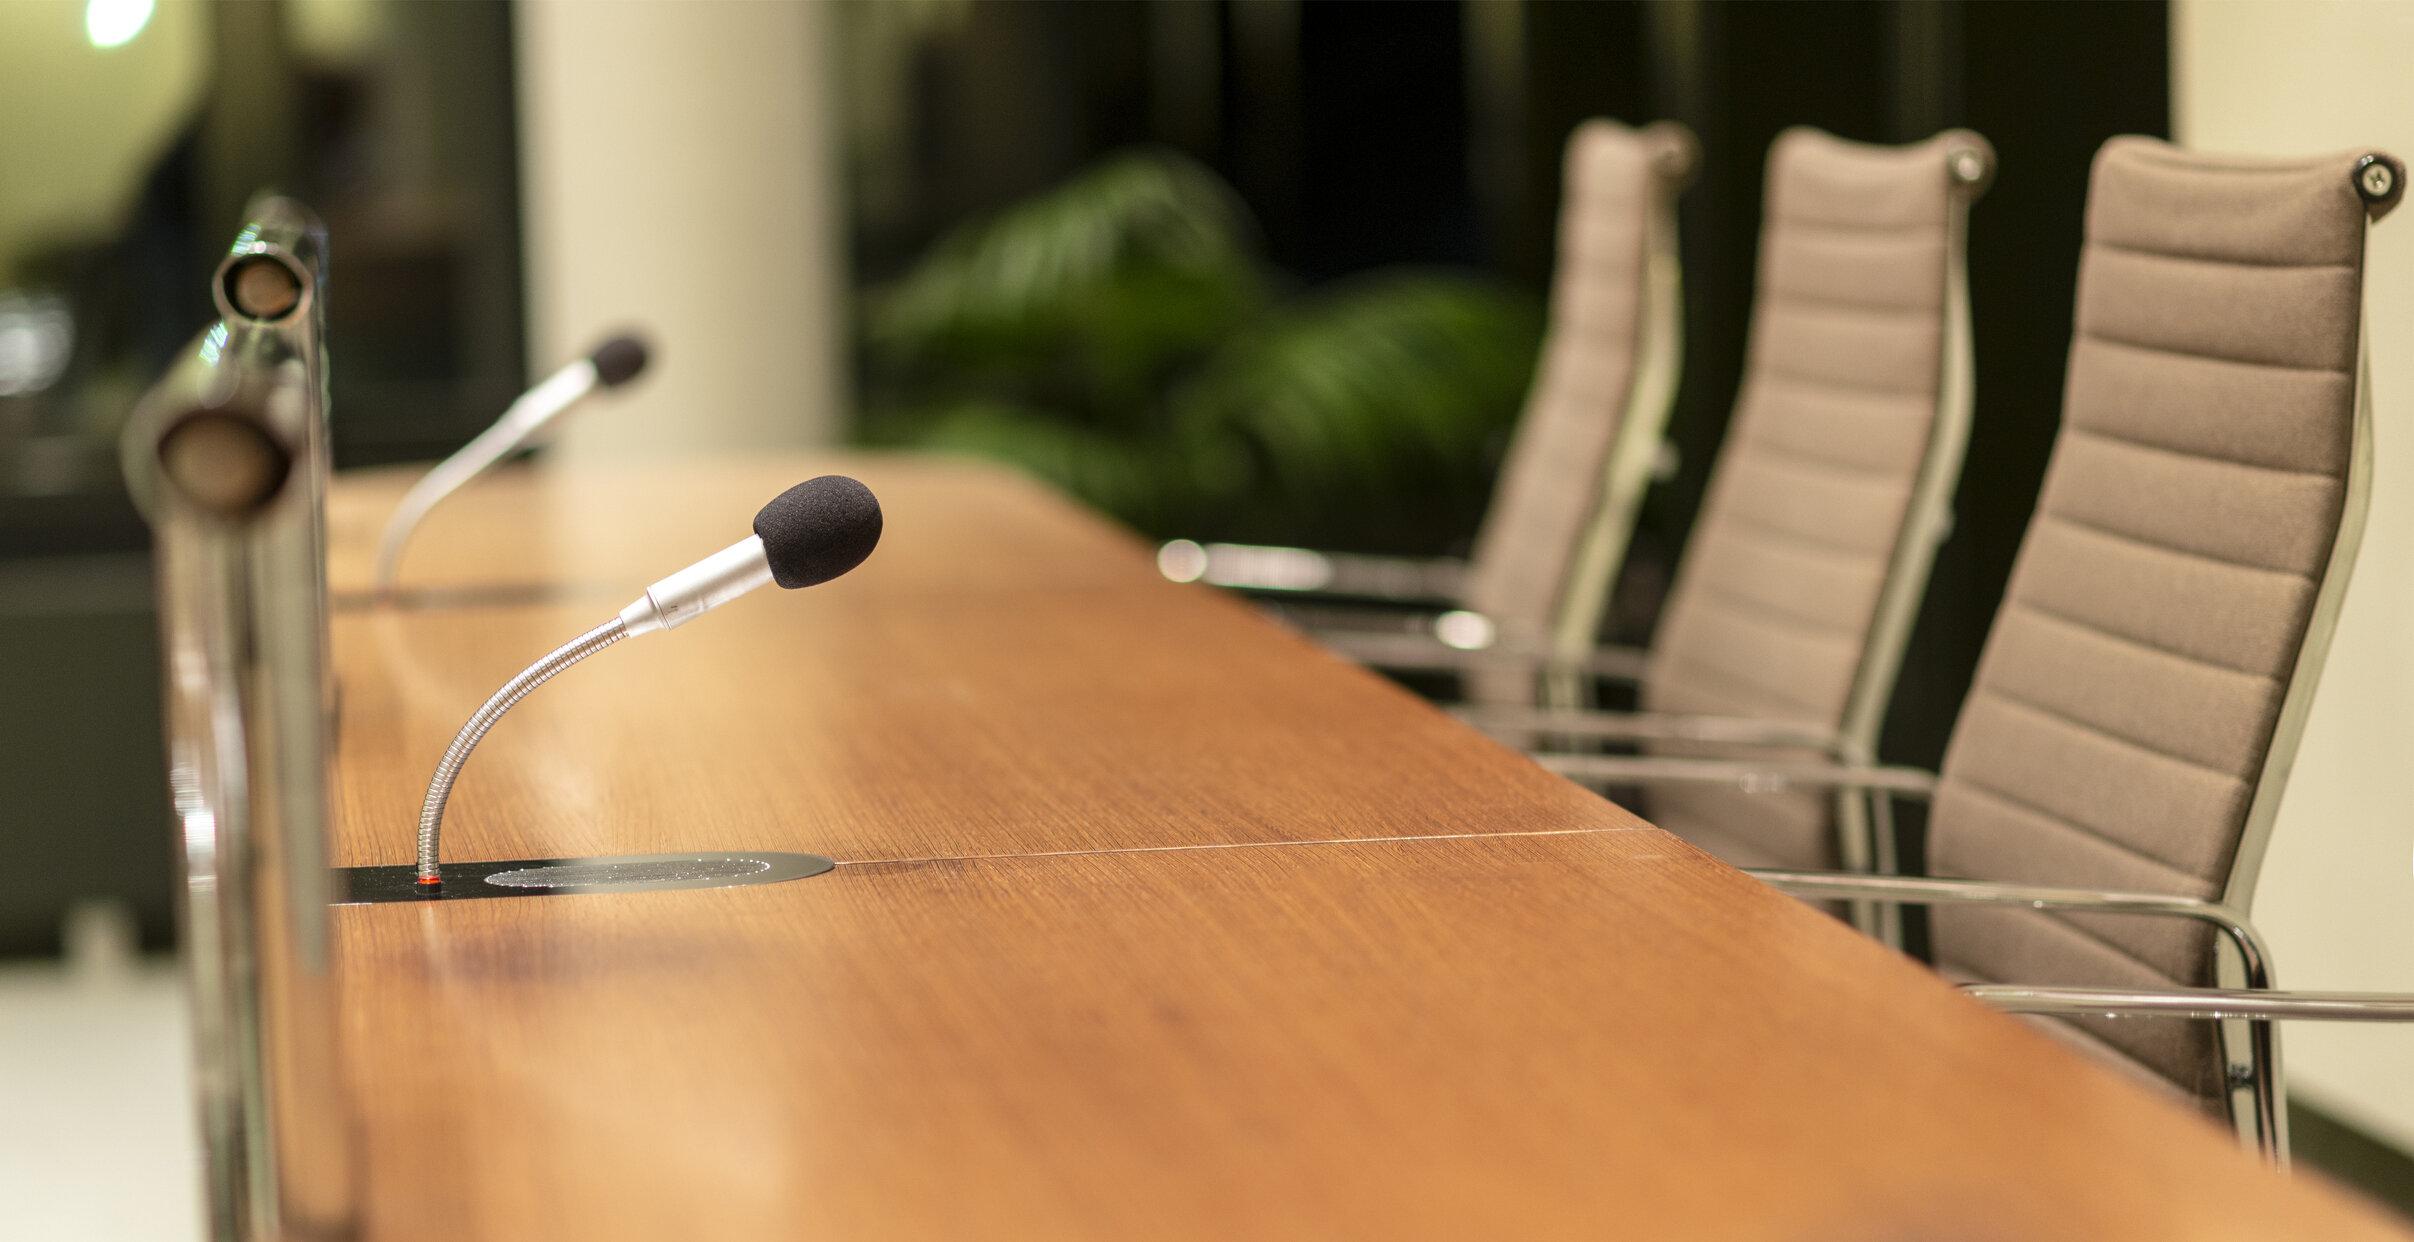 Video court arraignment